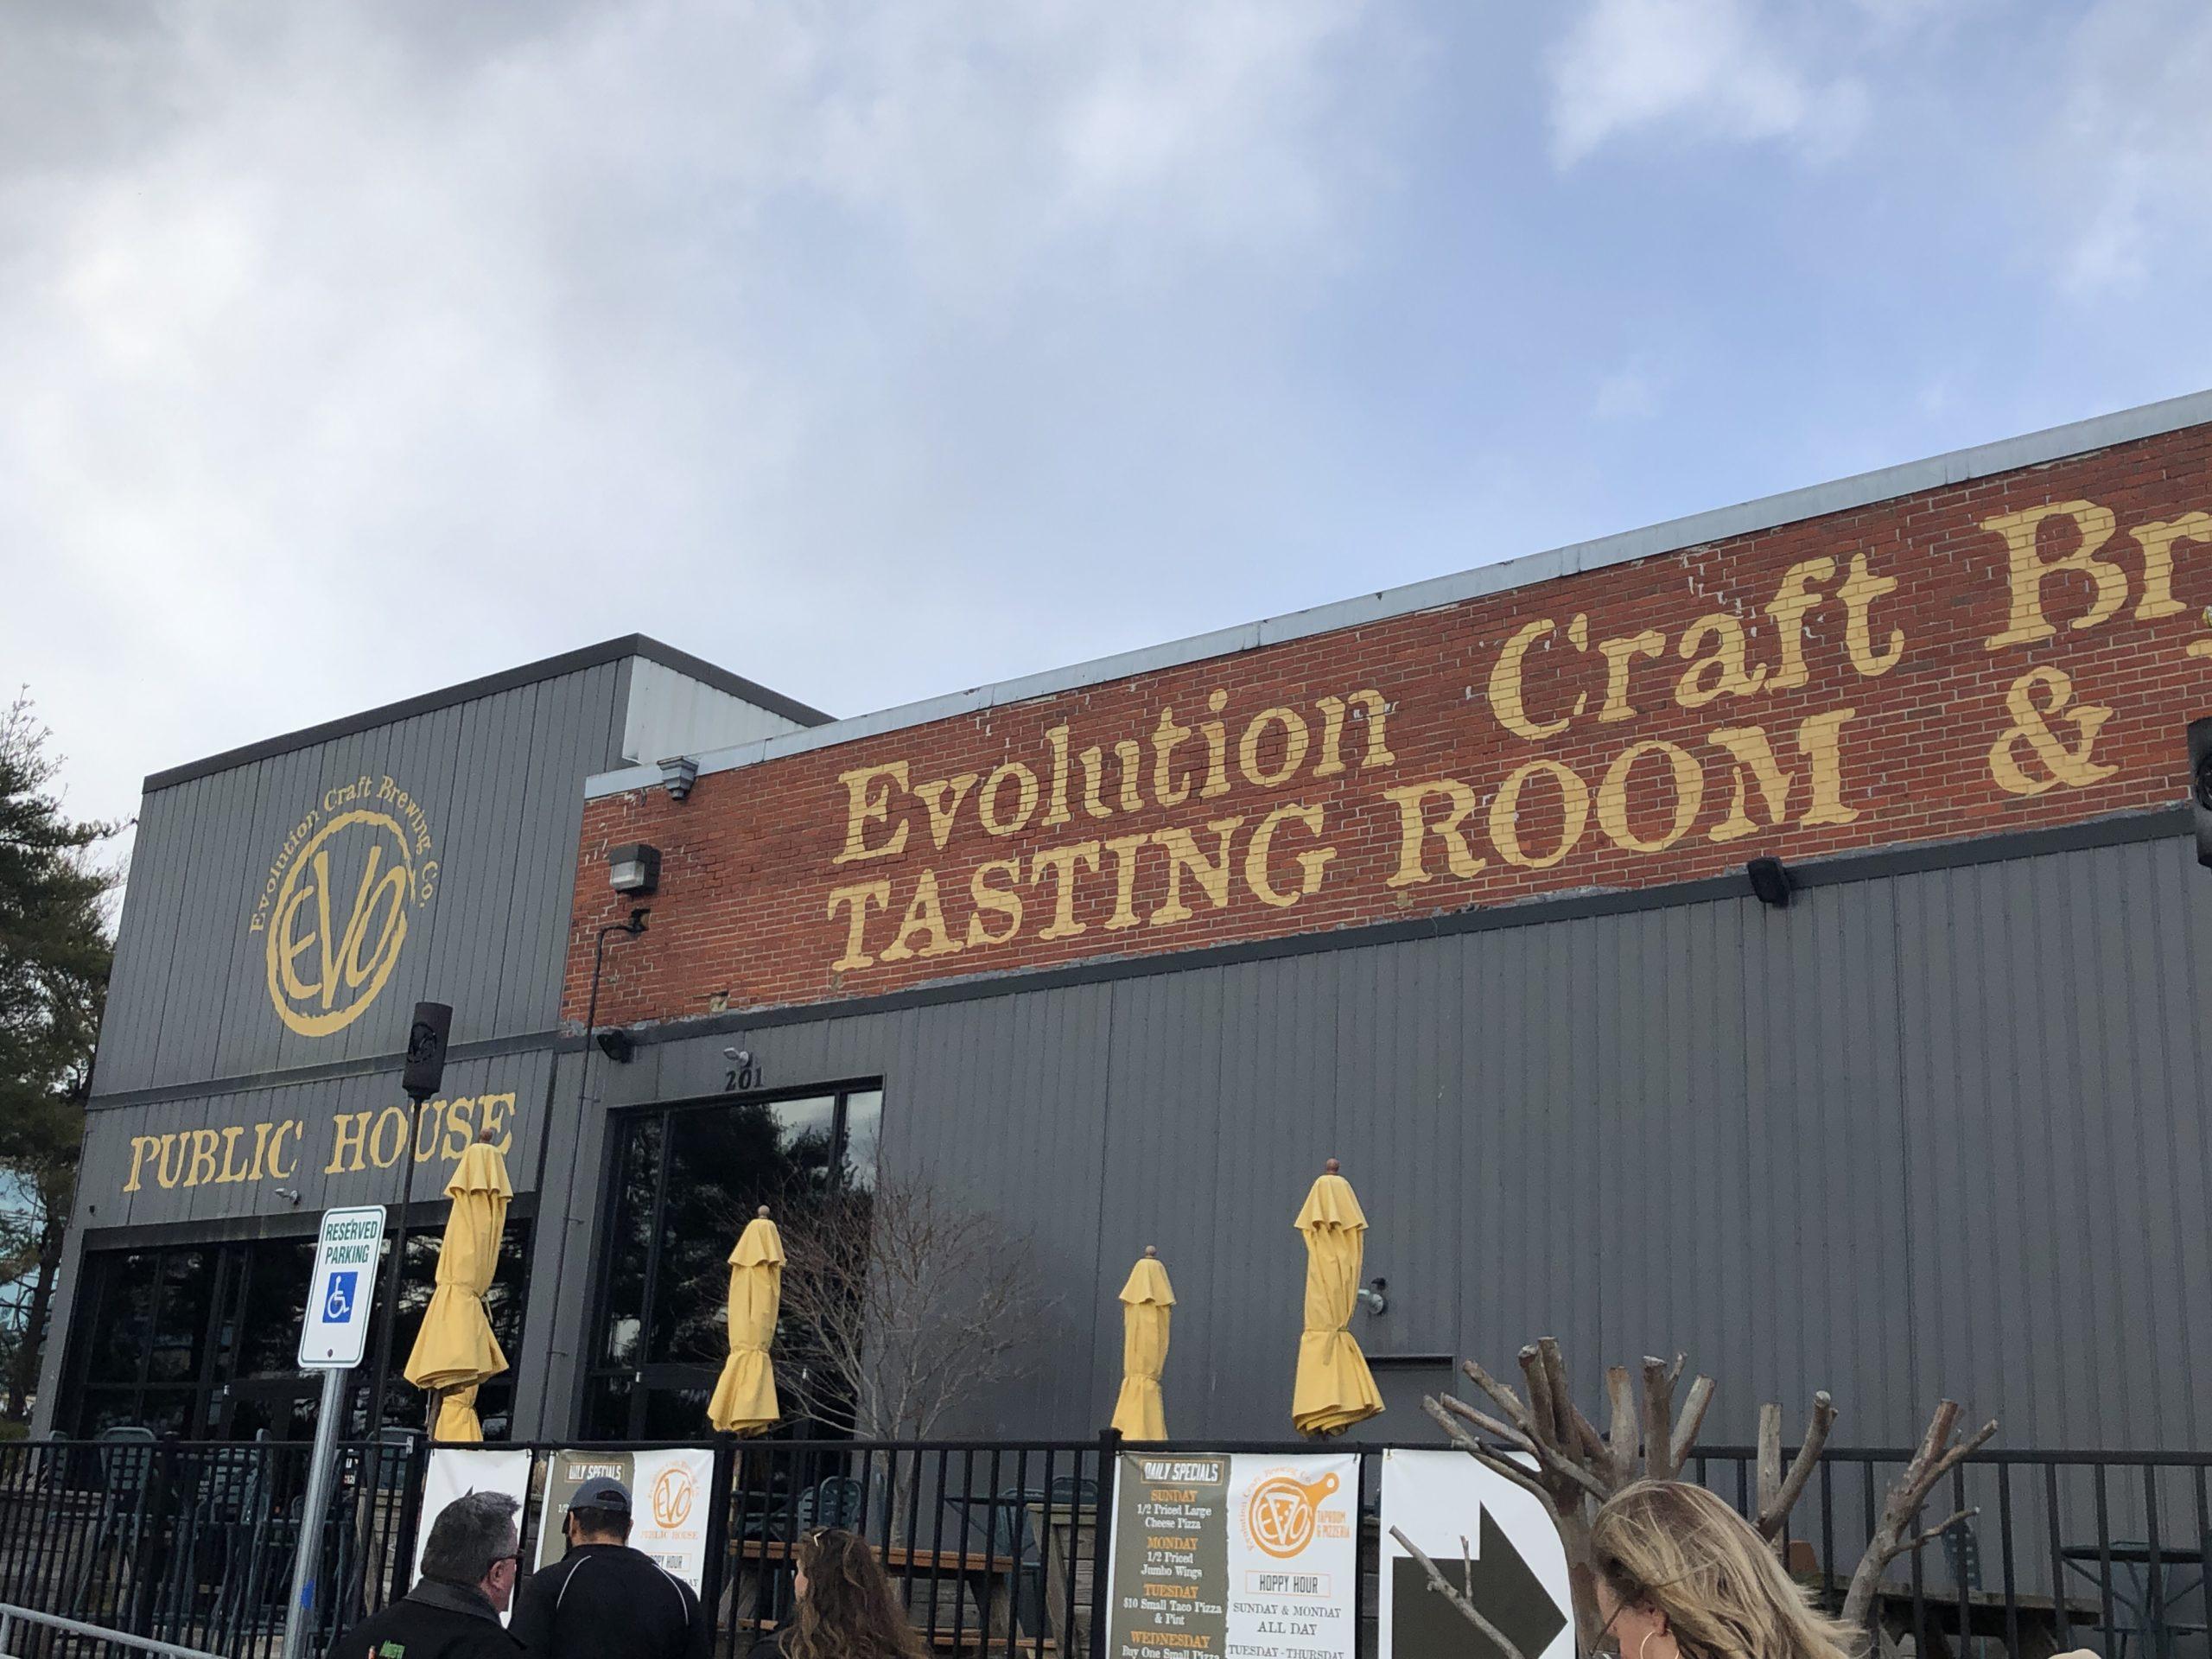 Evolution Craft Brewing Co.